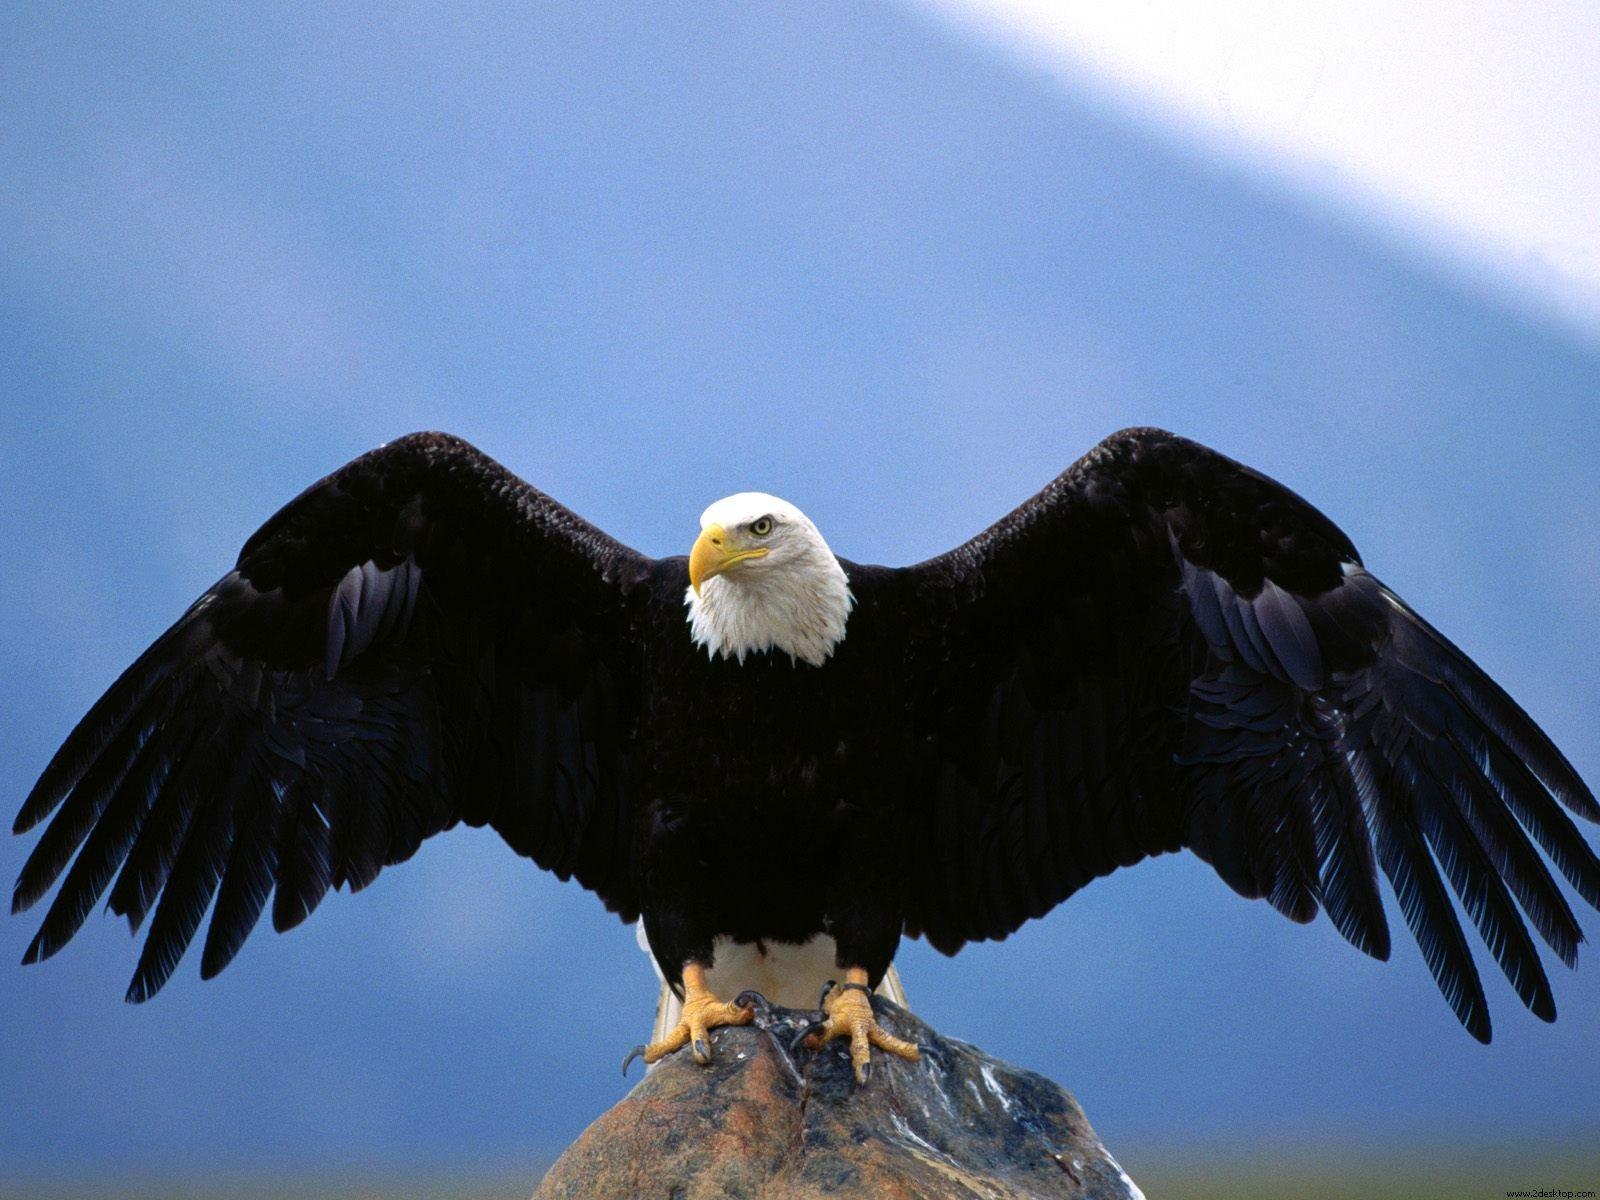 http://3.bp.blogspot.com/-DQF4sul4k1U/TjmQ0IVSUgI/AAAAAAAAAOw/LRziJaFgJIg/s1600/Bald+Eagle+Wallpapers+1.jpg